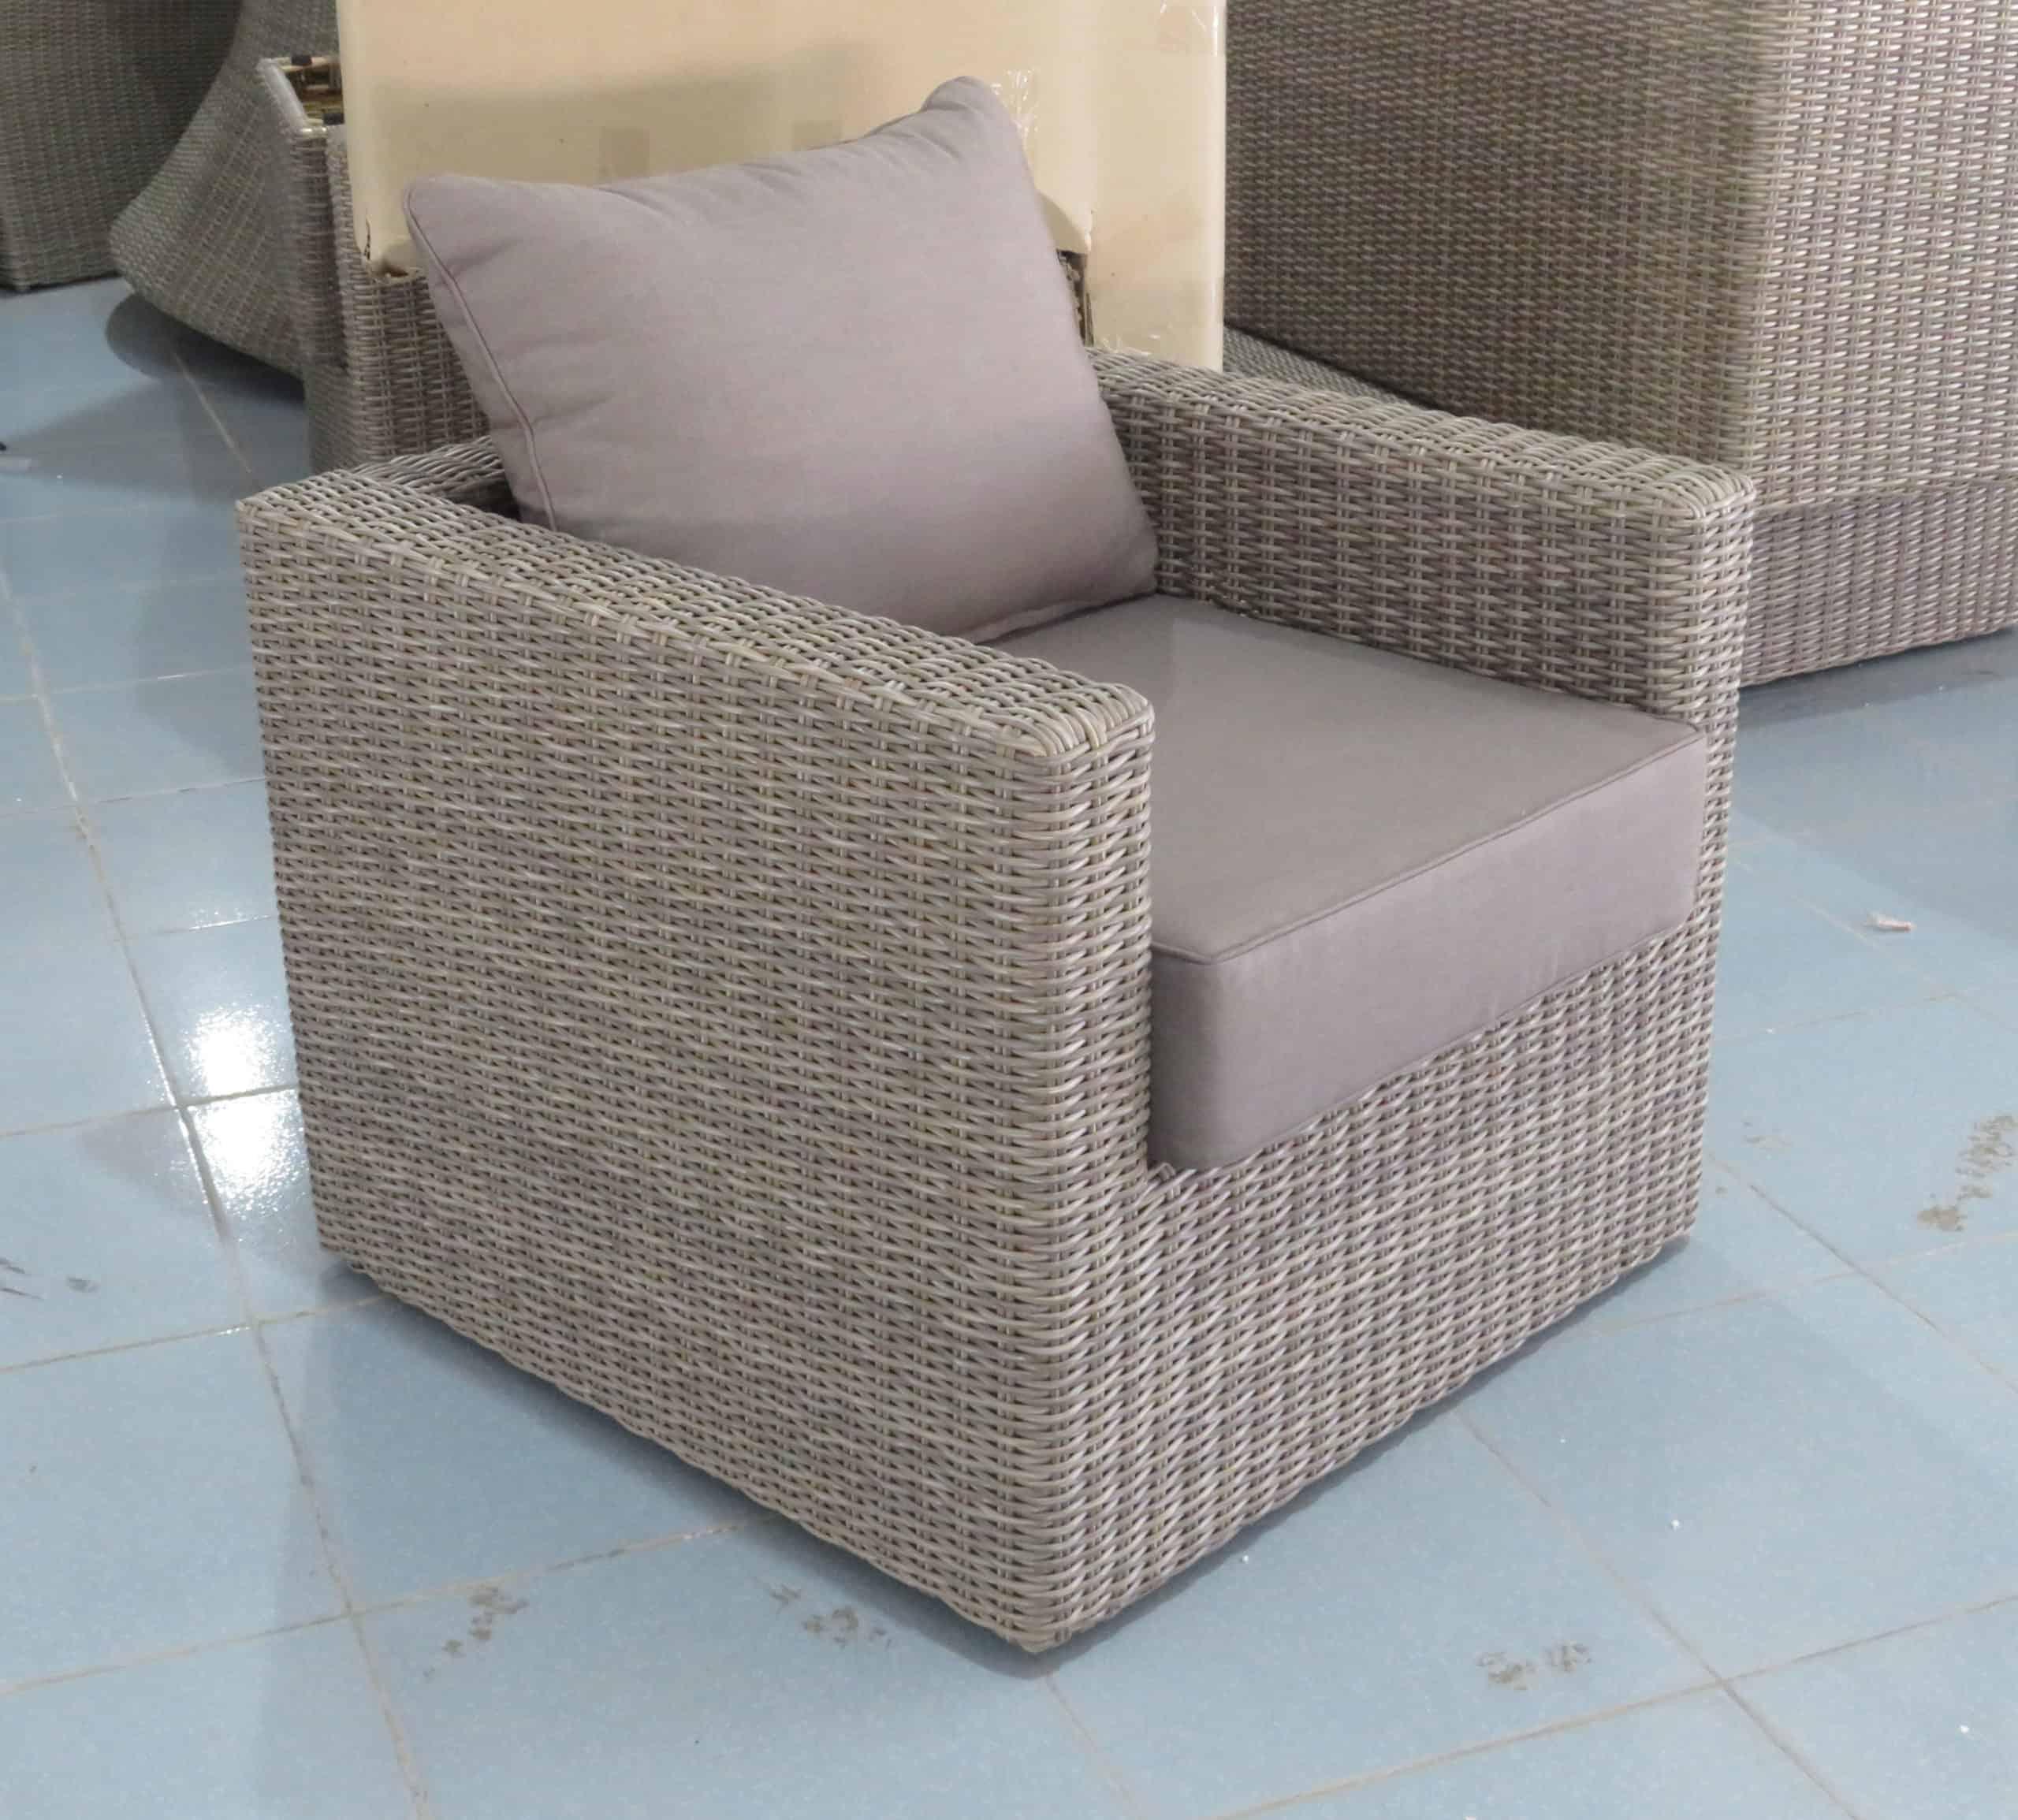 Patros Lounge Chair - Garden Furniture For Sale Dublin Ireland